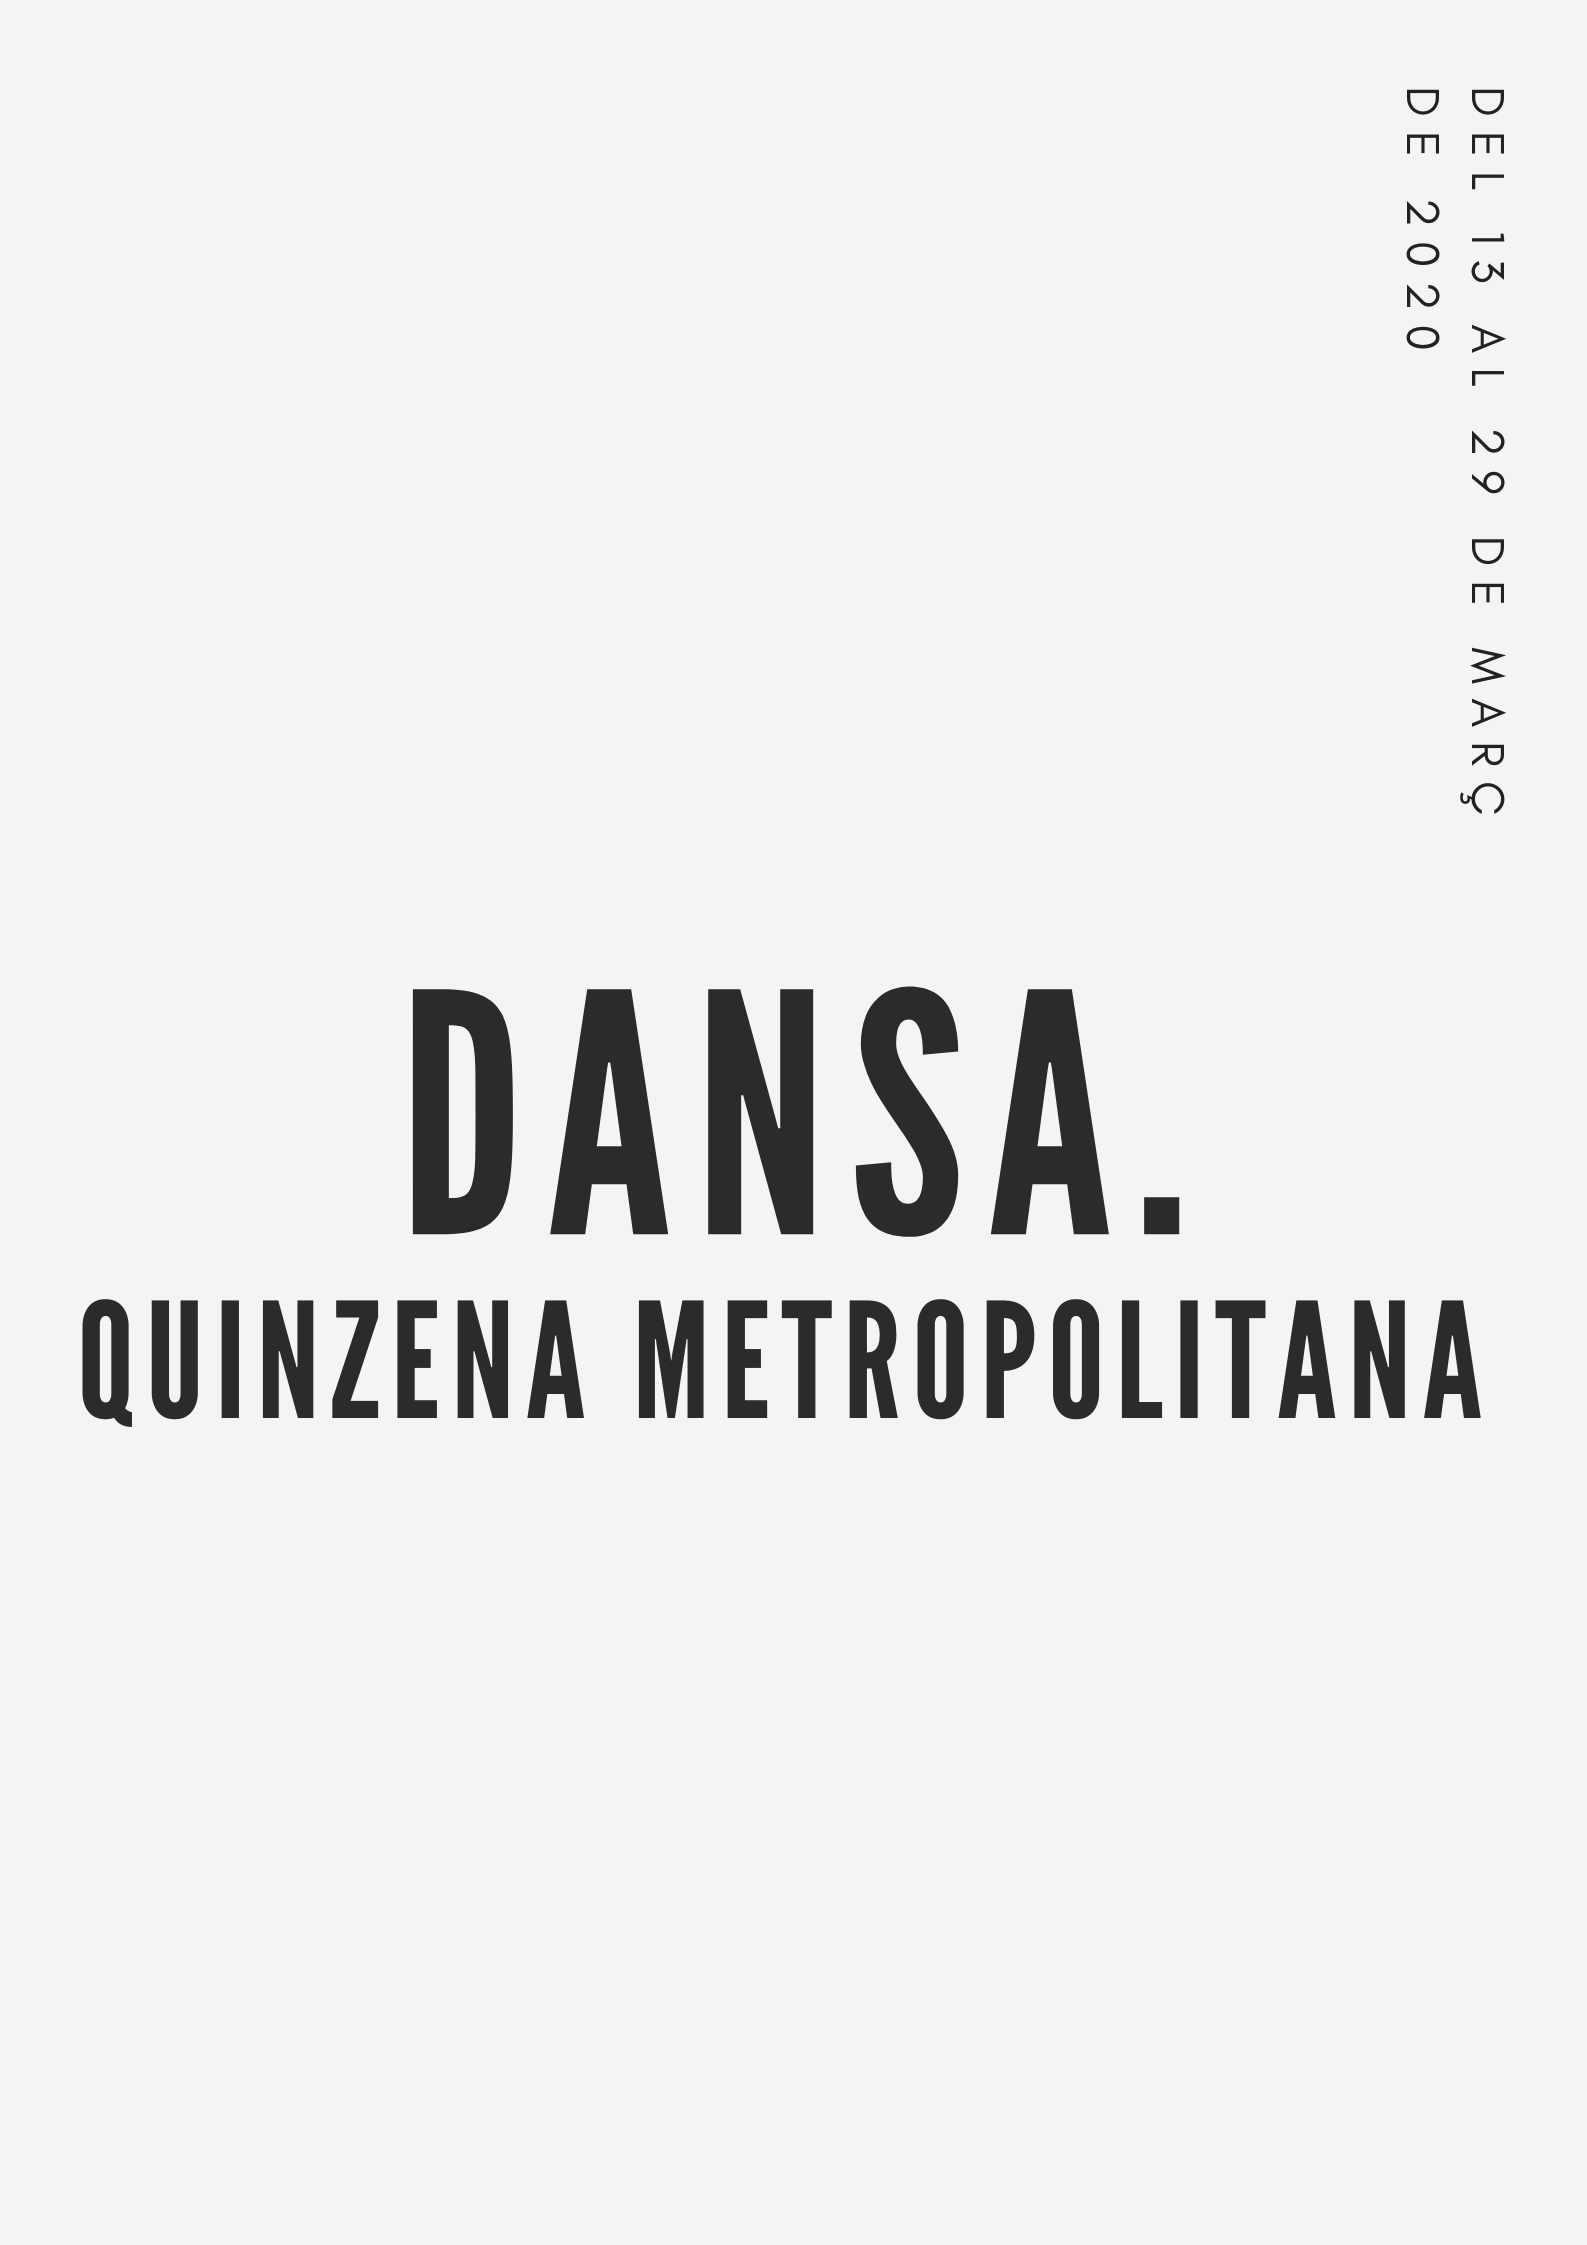 QUINZENA DE LA DANSA METROPOLITANA